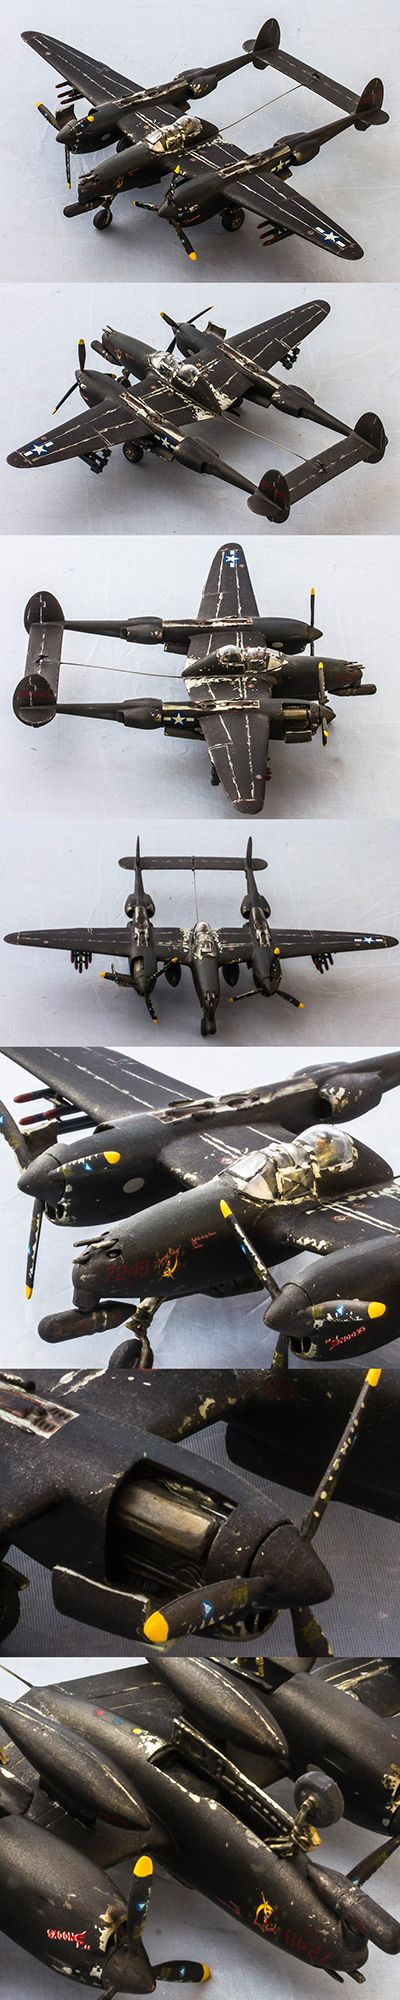 "Lockheed P-38 ""Lightning"" Night Fighter by Korhan AKBAYTOGAN"